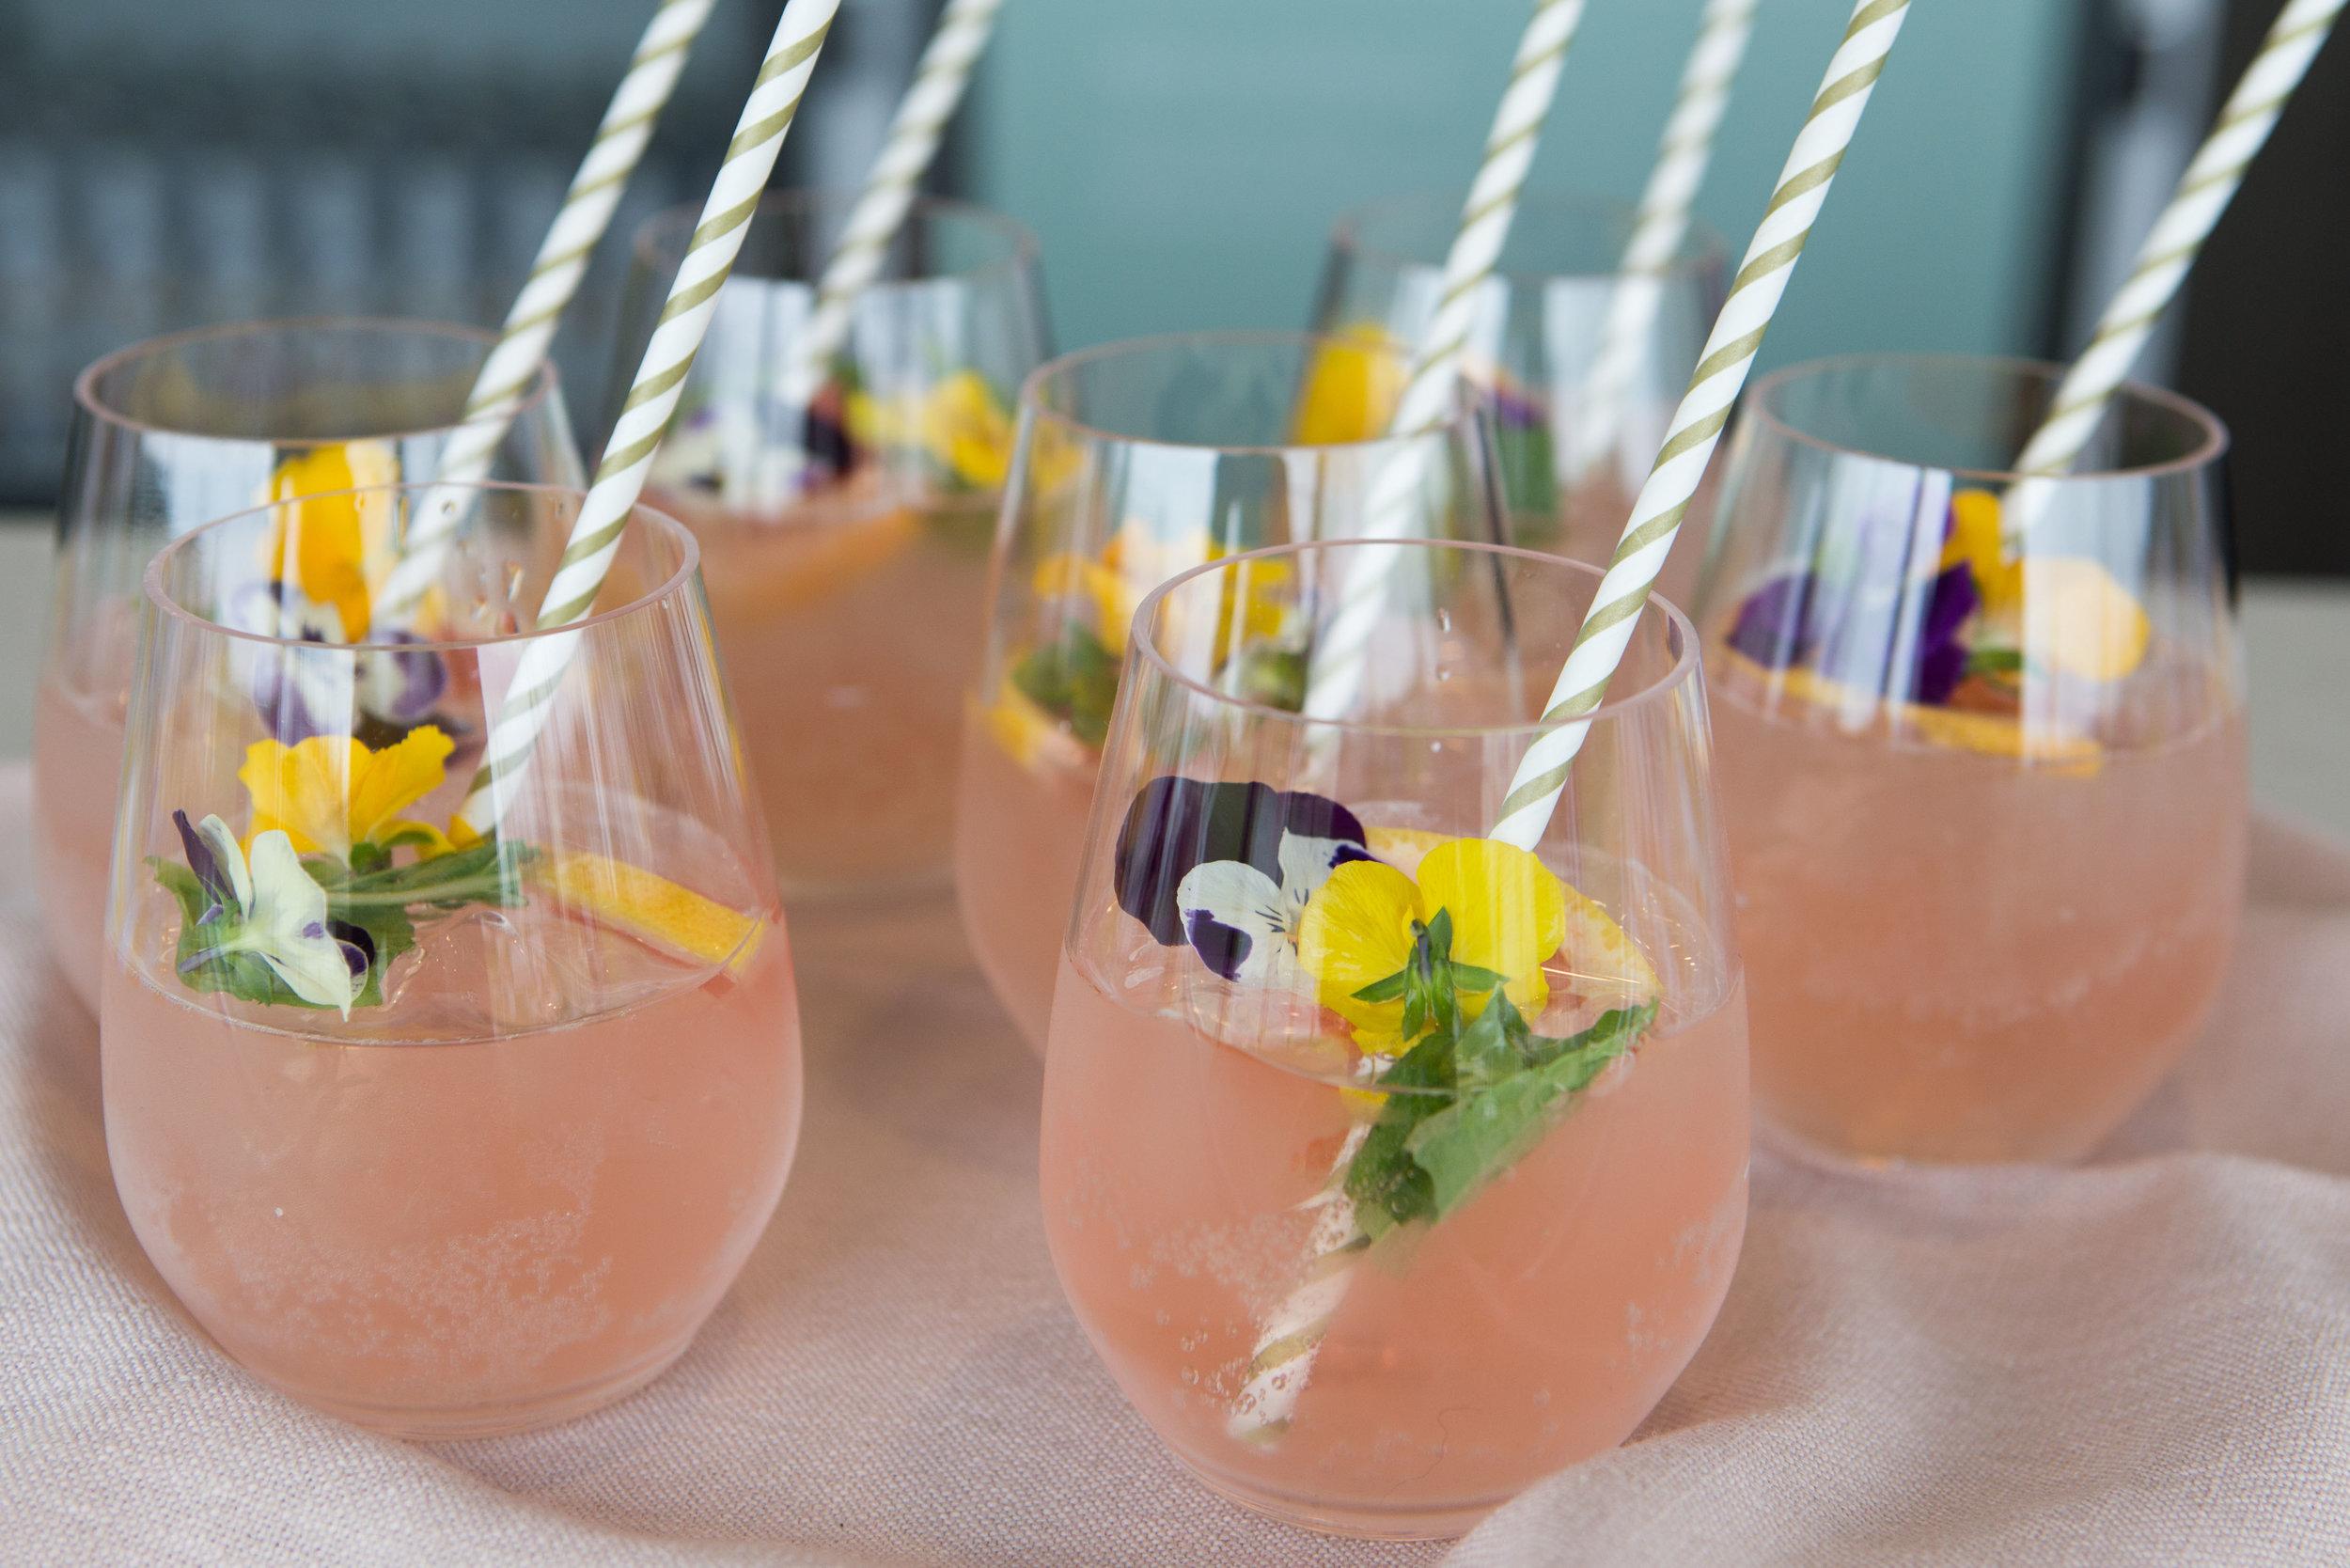 yellowglen-terrace-sofitel-girls-day-out-2016-drinks-2.jpg